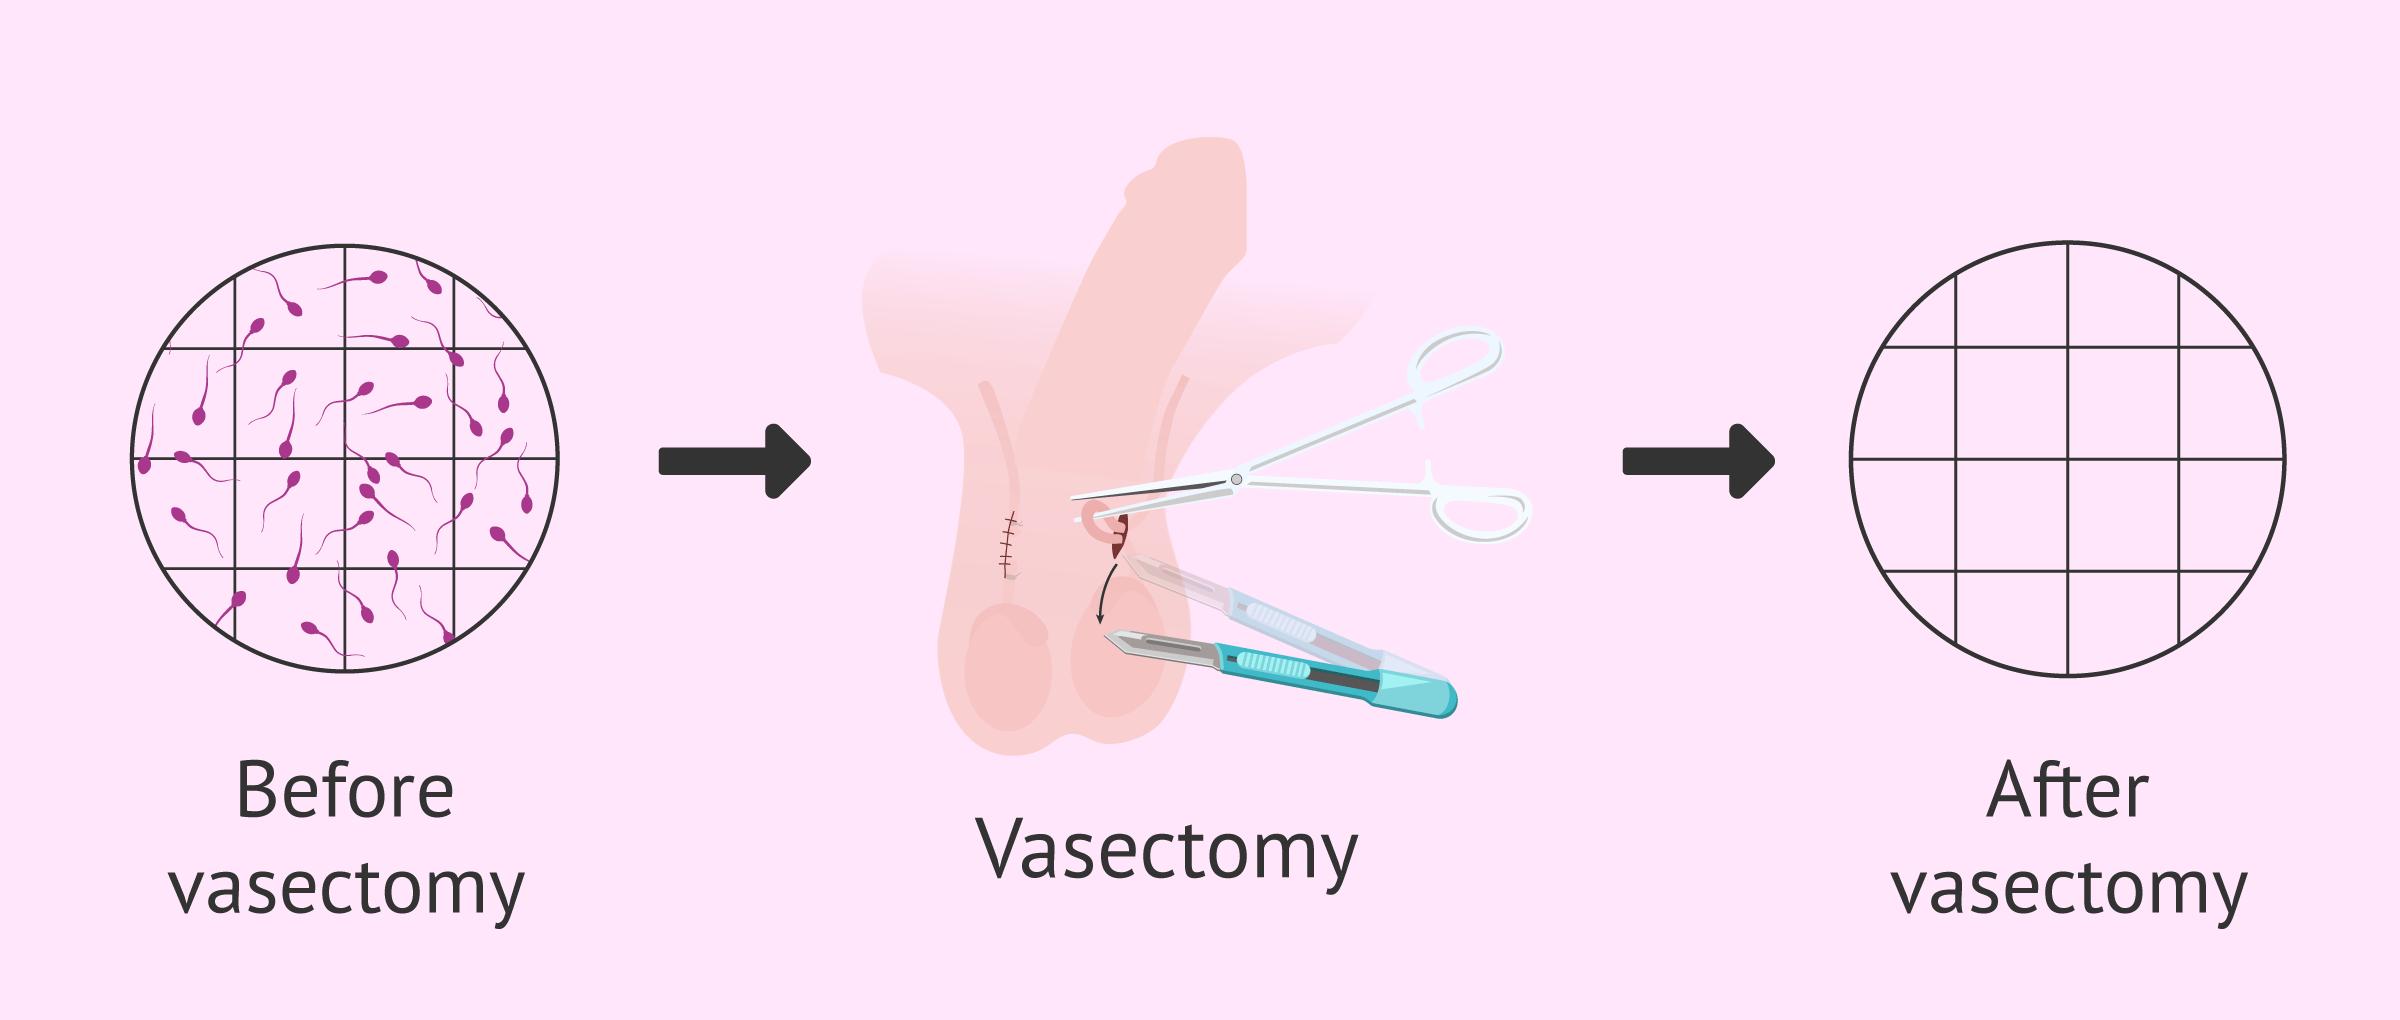 Azoospermia after vasectomy